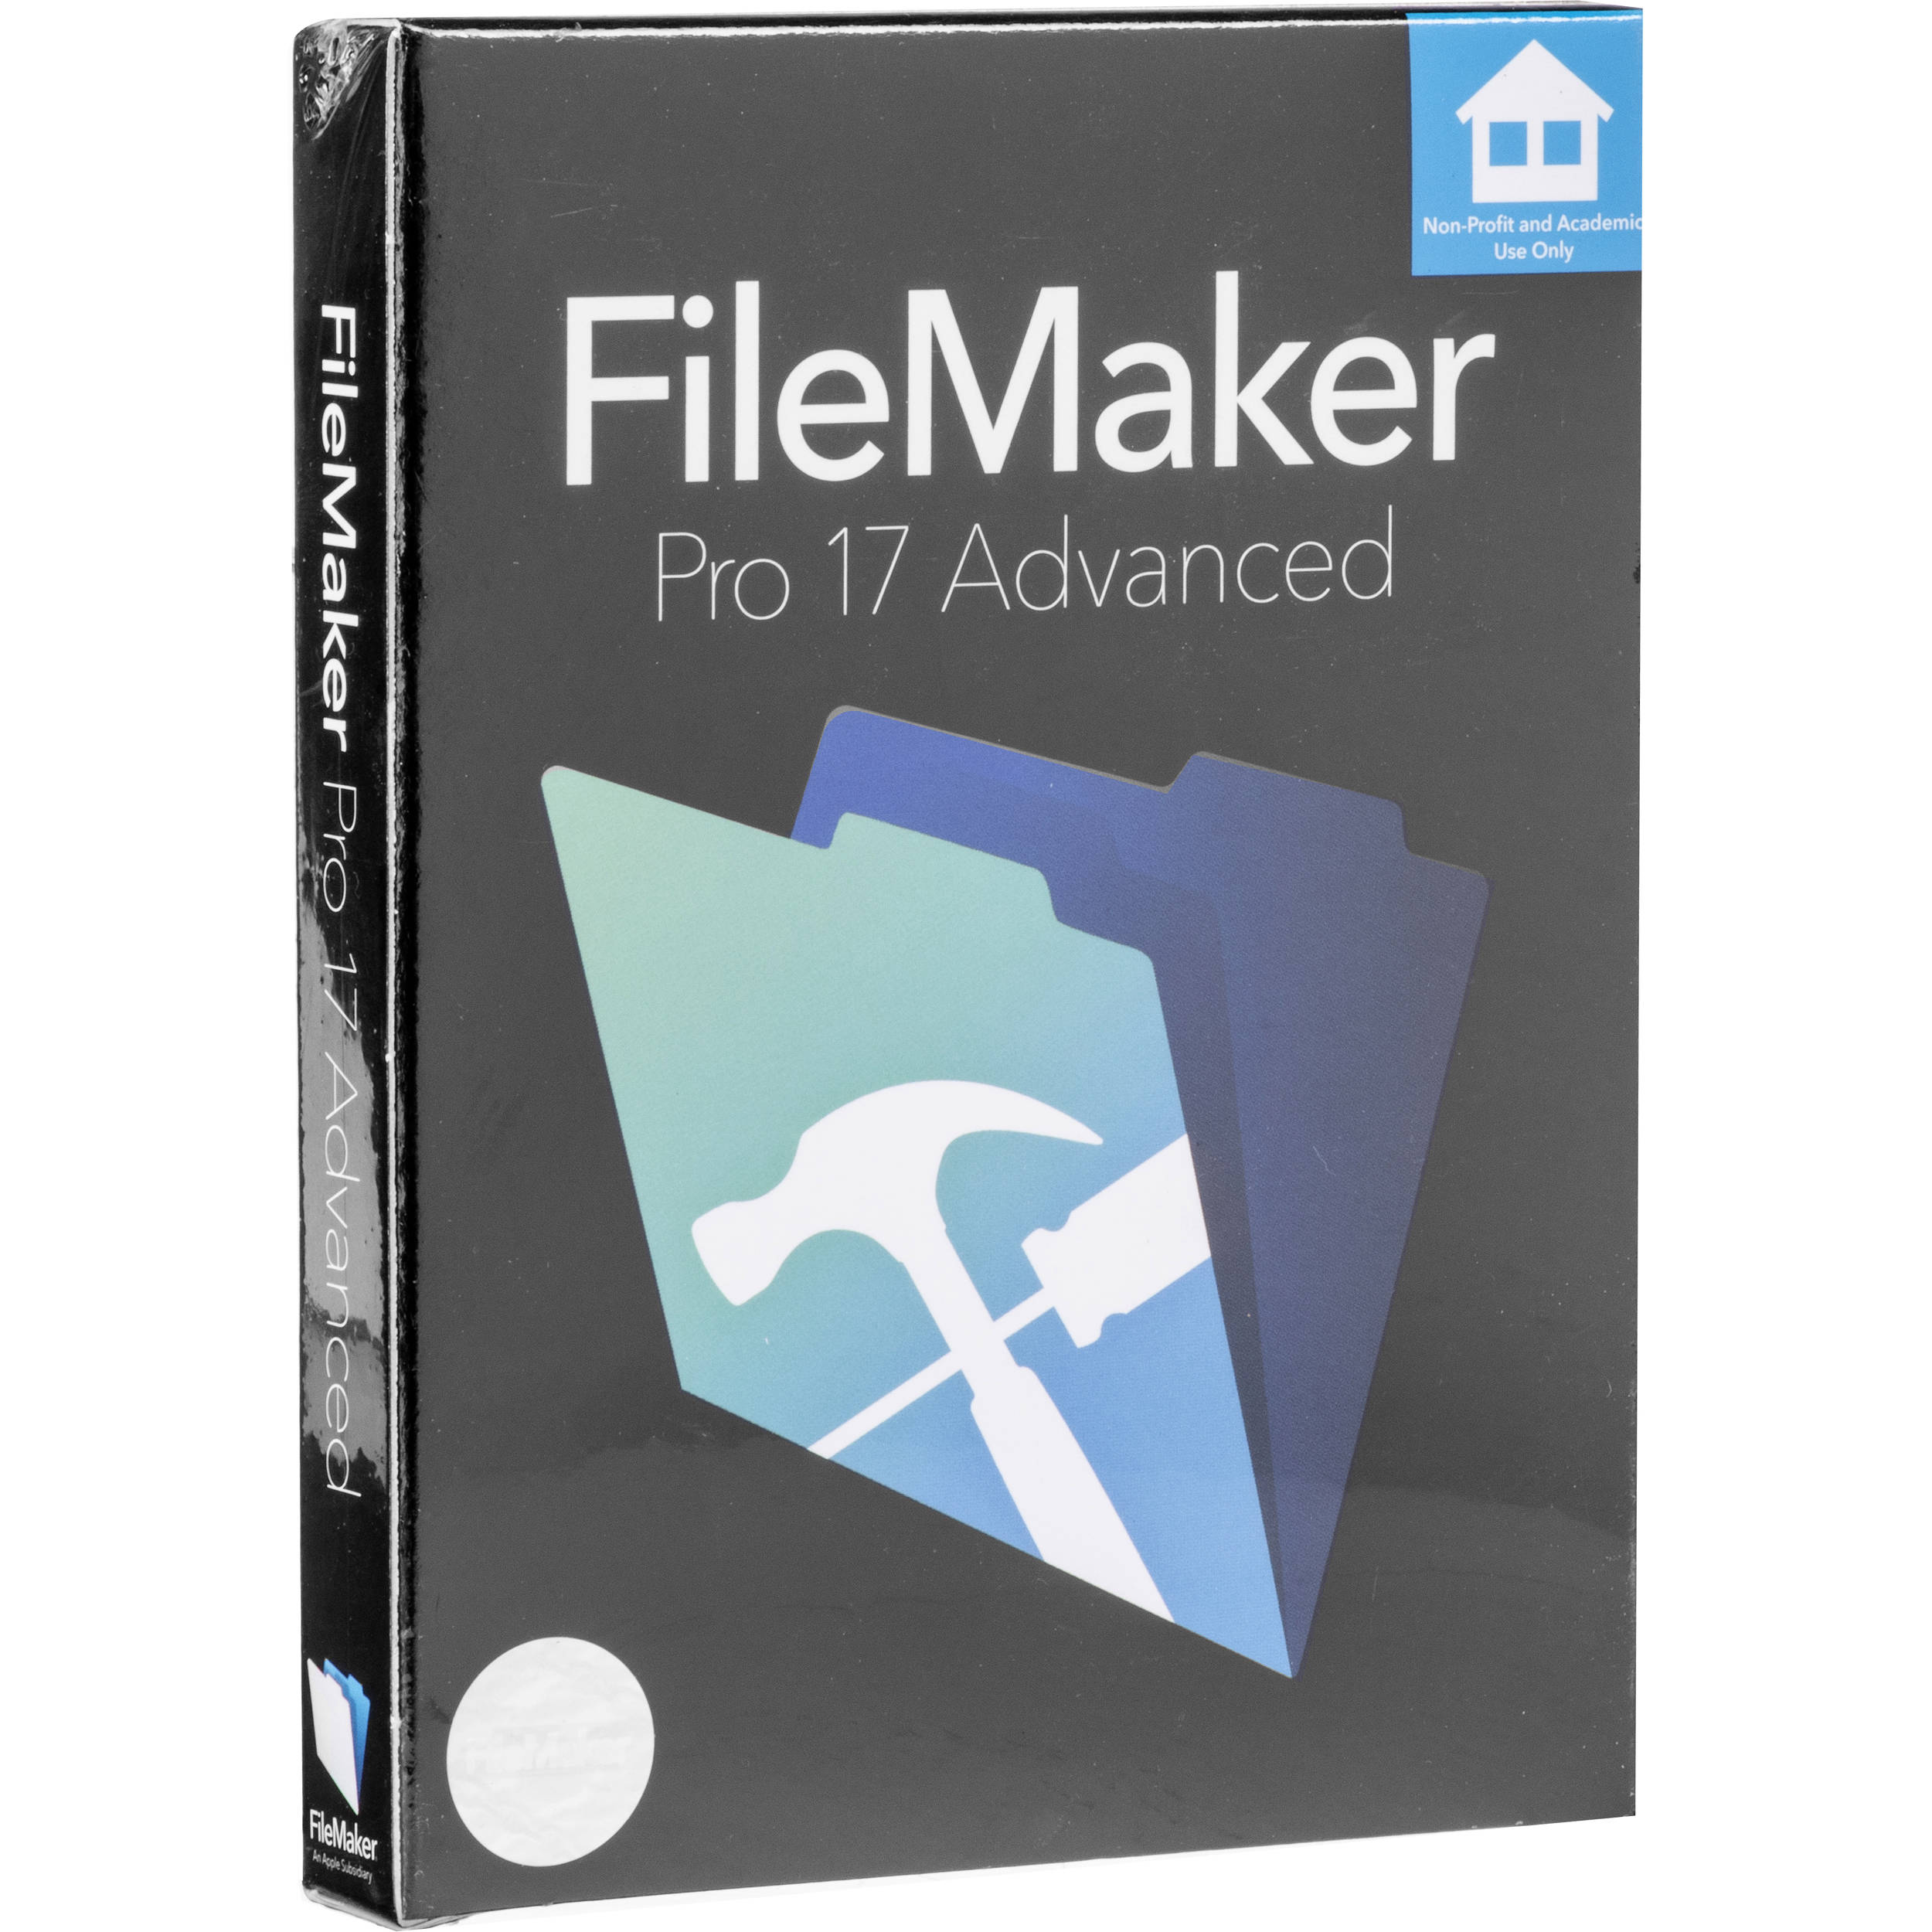 Filemaker Pro 17 Advanced Hlzb2zma Bh Photo Video